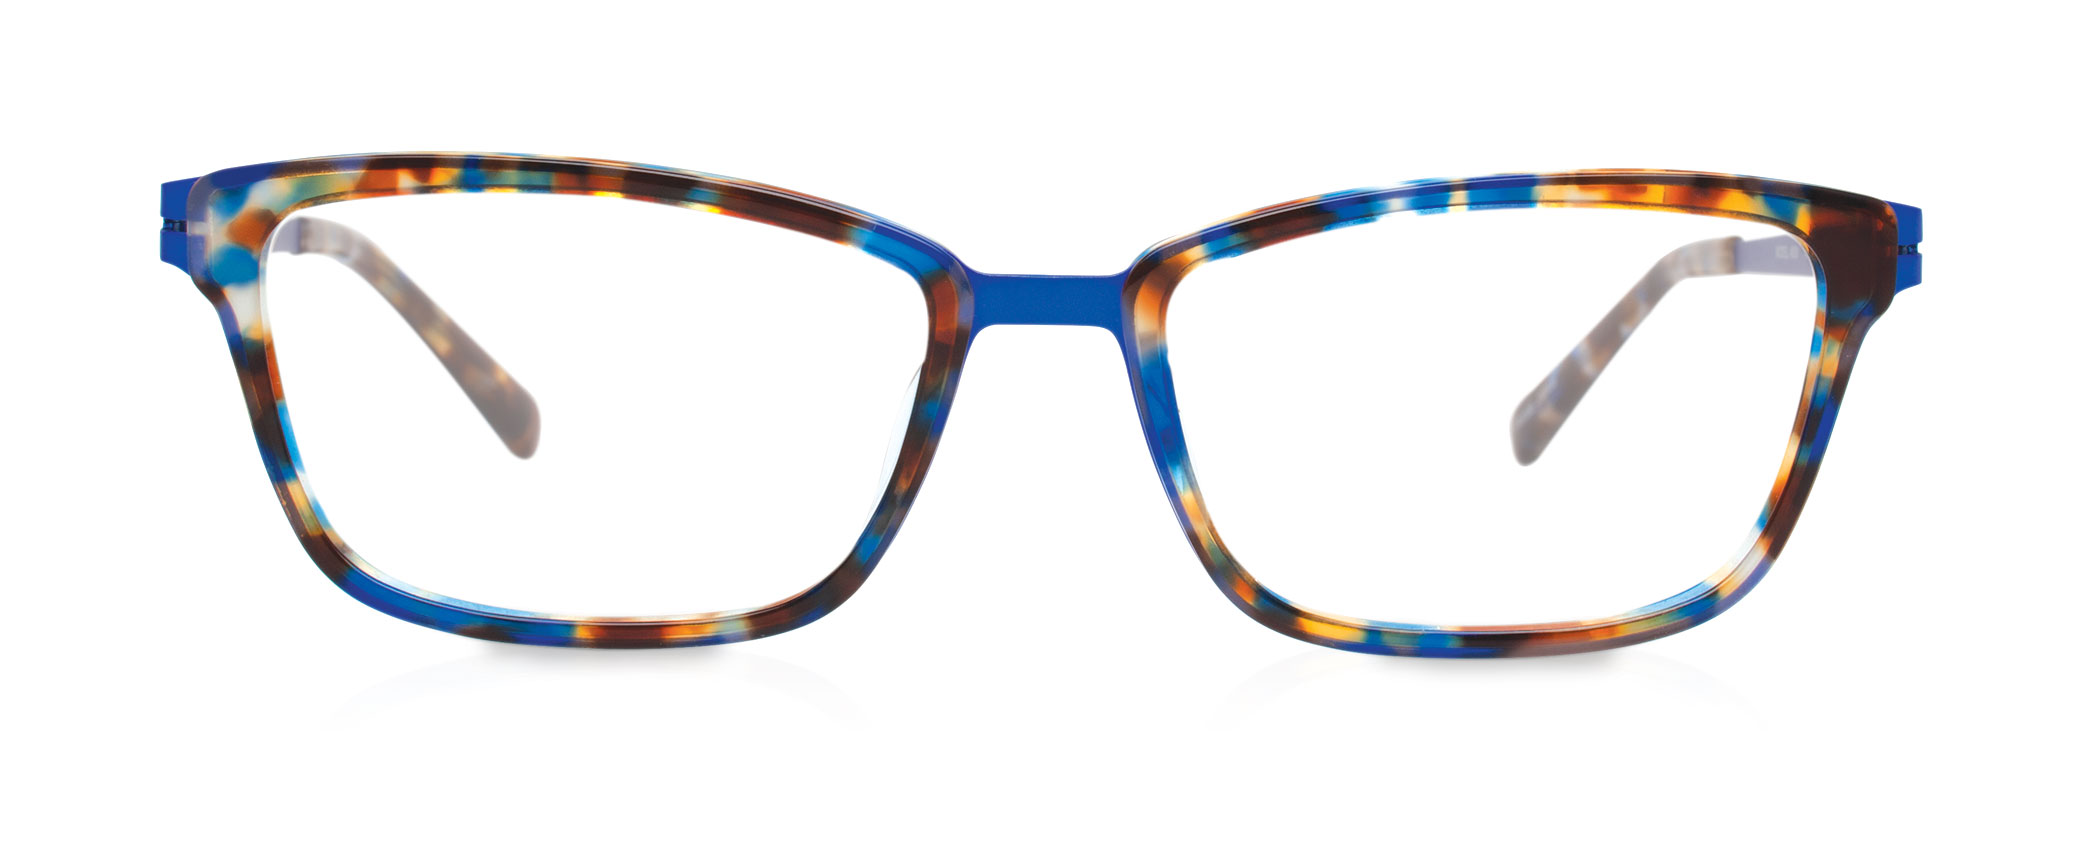 Glasses Frames Lancaster Pa : INVISIONMAG.COM - Hot Sellers: April 2016